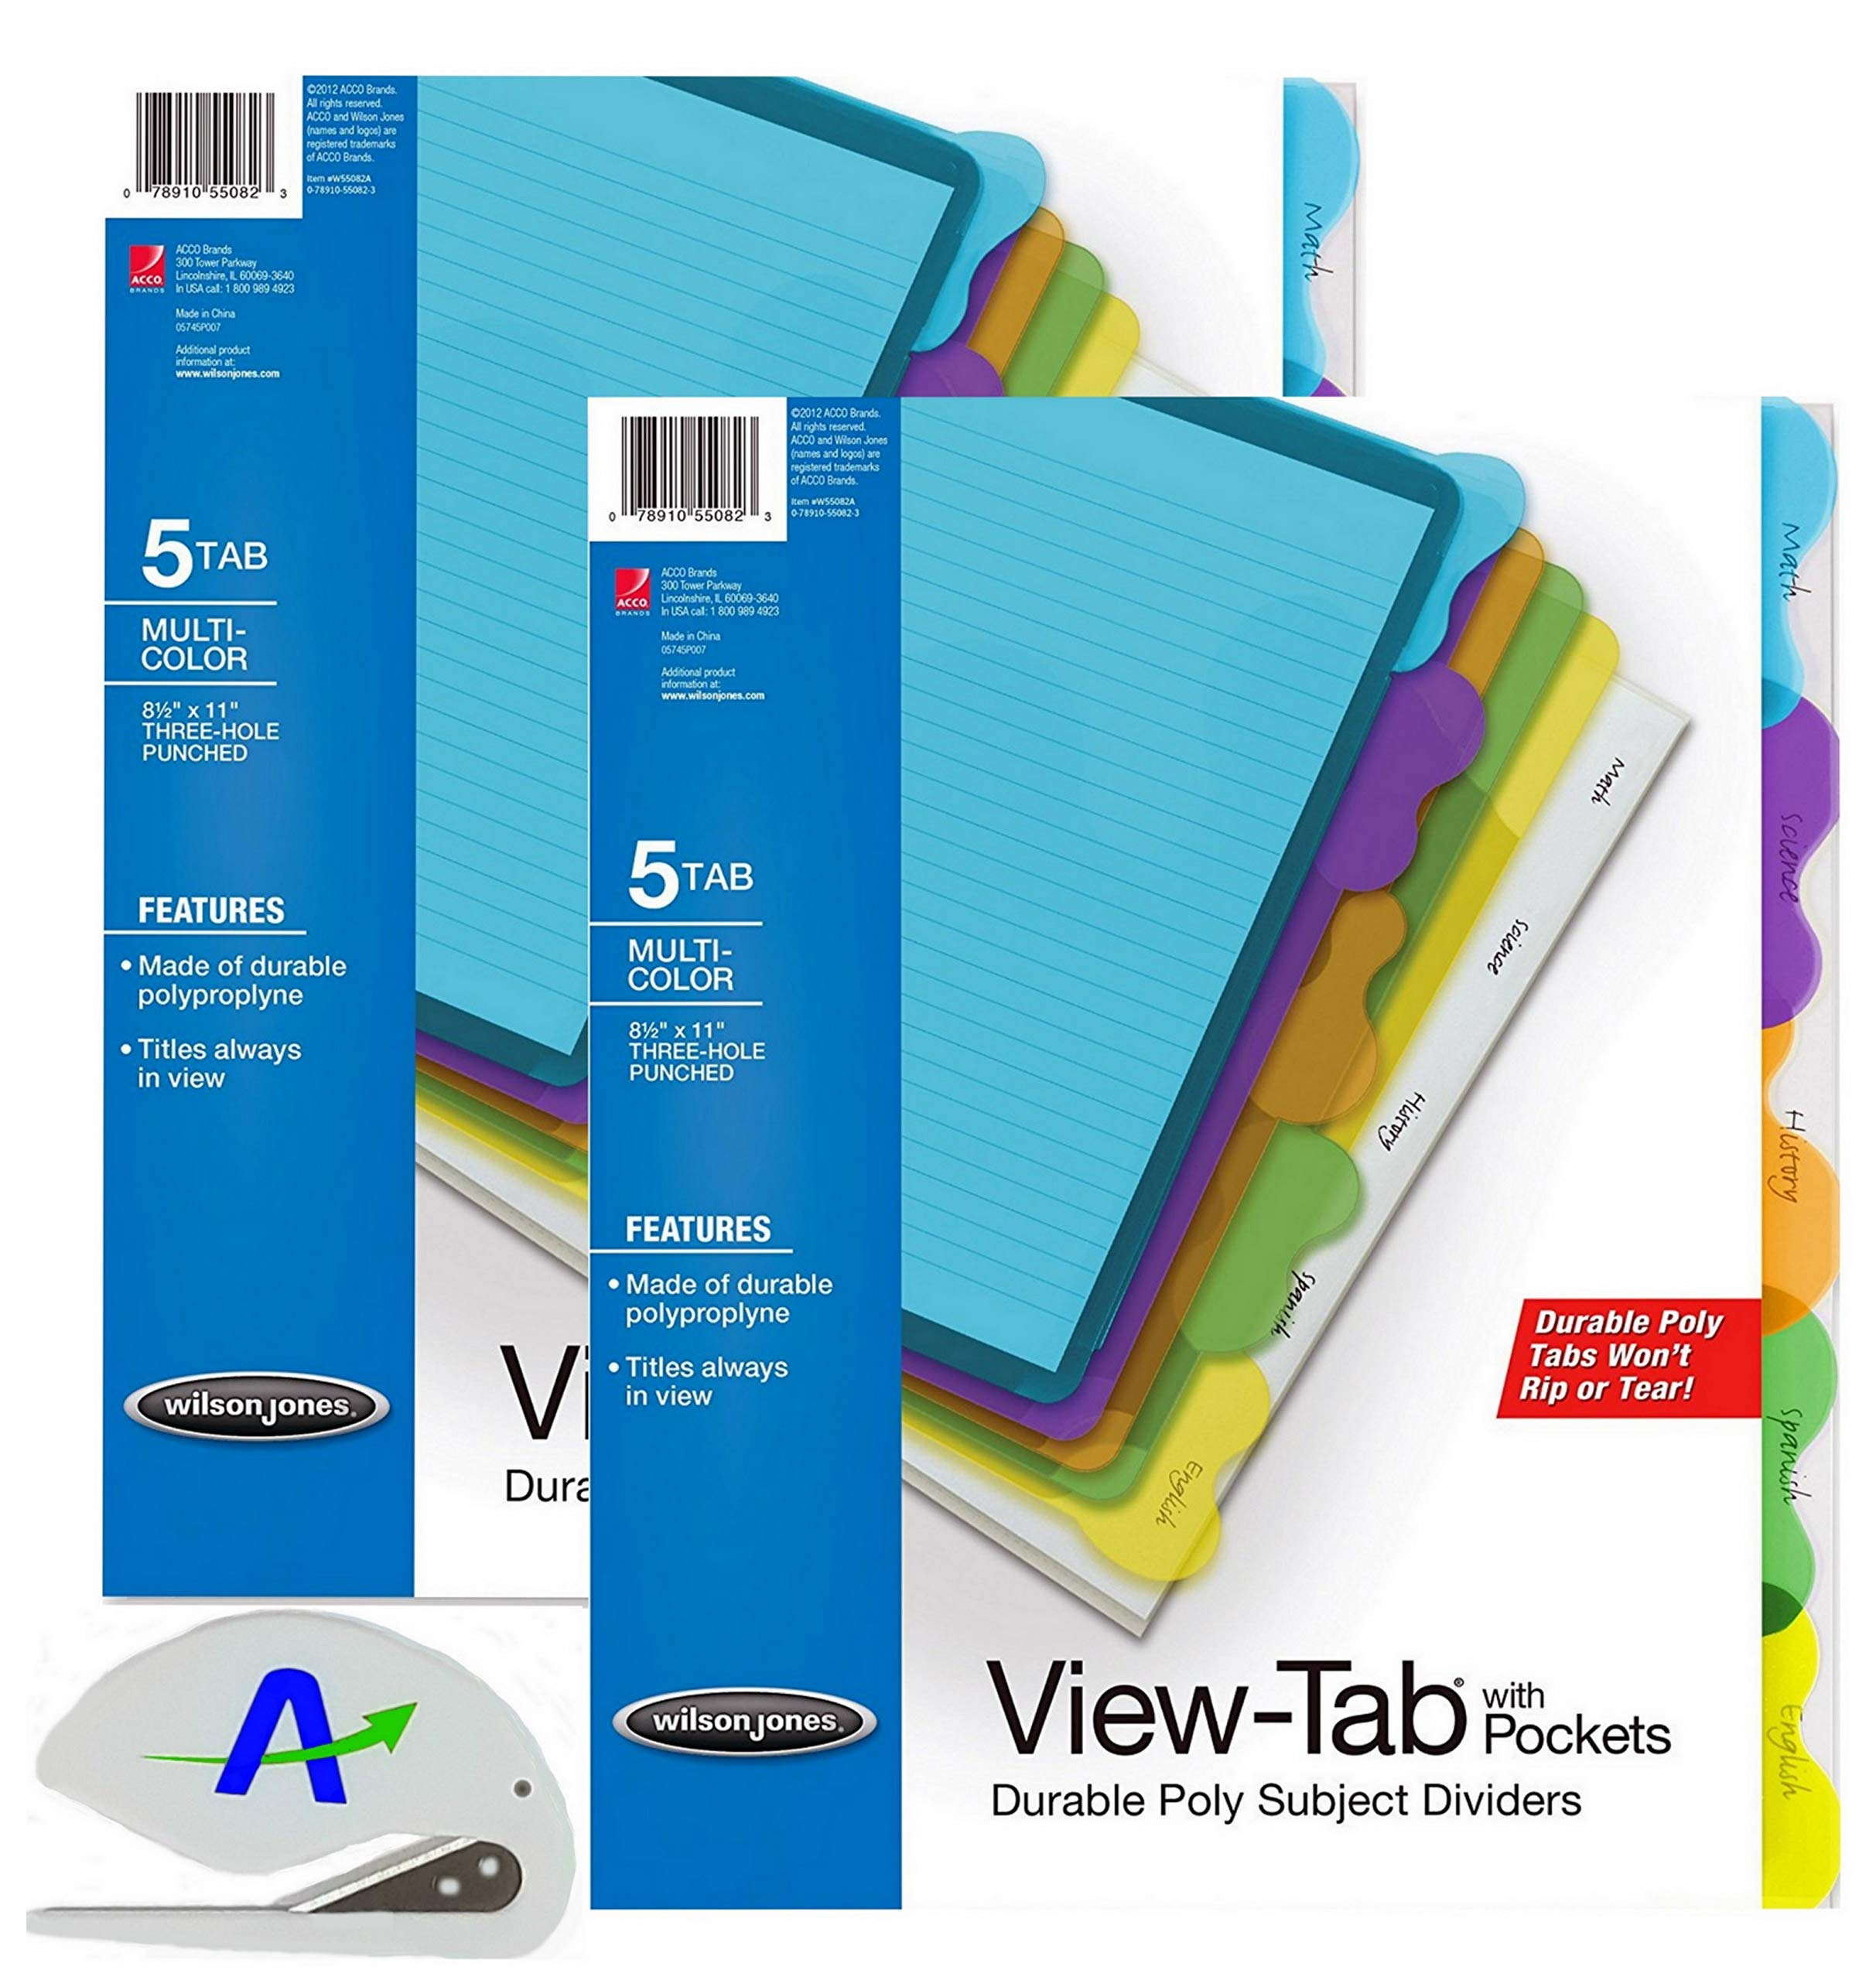 Wilson Jones View-Tab Transparent Dividers, Student Index with Pockets, 5-Tab Set, Multicolor Tabs, 2 Sets of 5 Plus Bonus AdvantageOP Letter Opener (W55082)